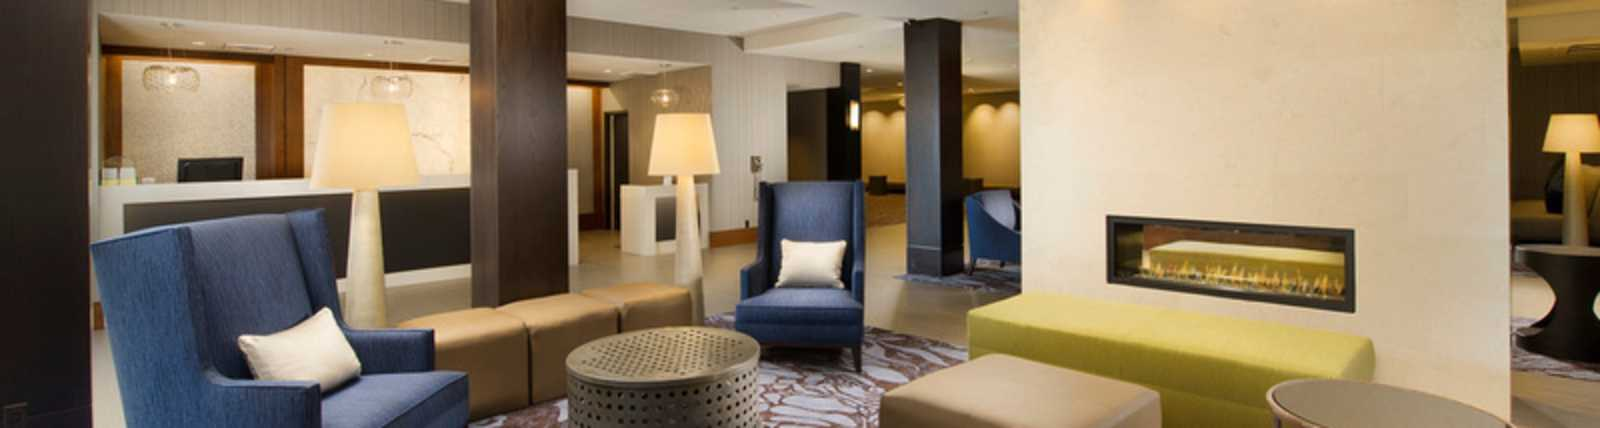 Lobby & Lounge Space